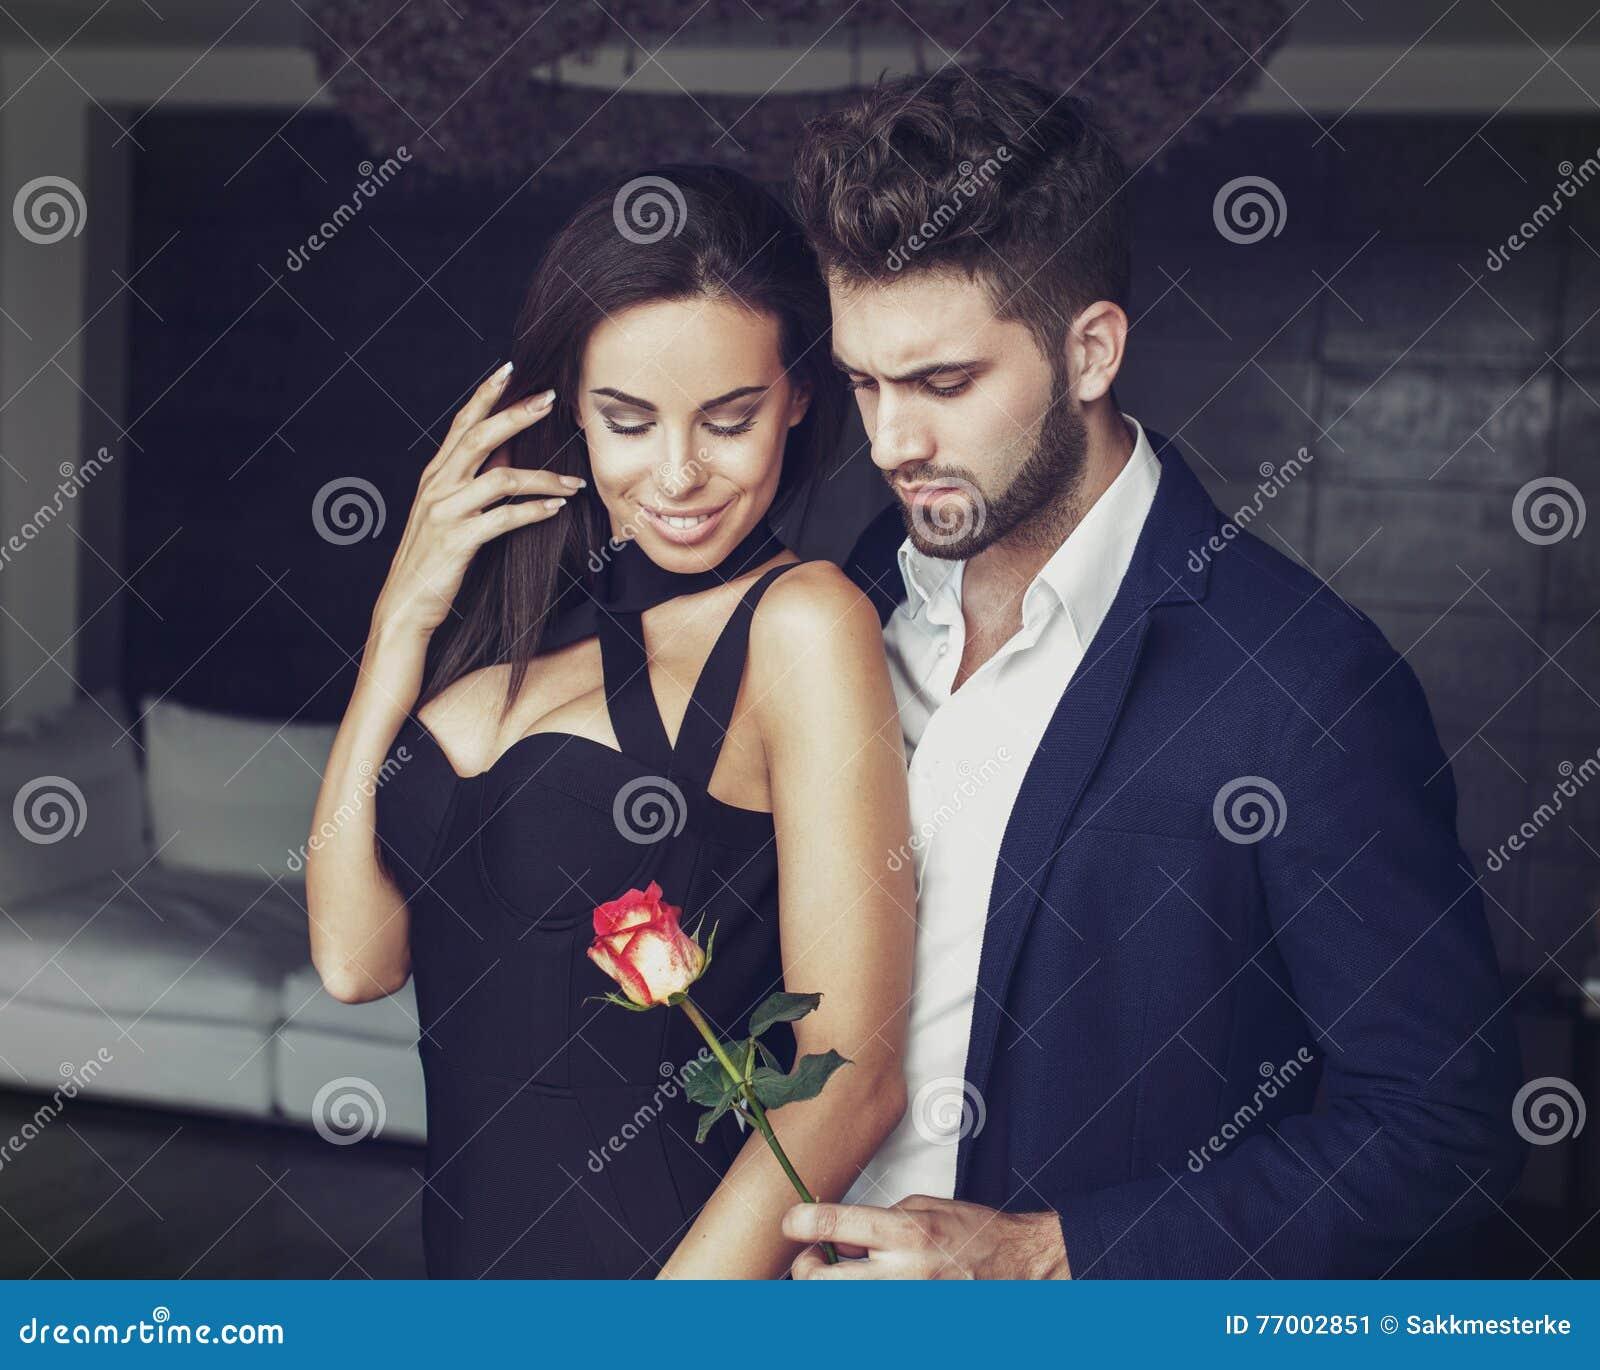 steg dating